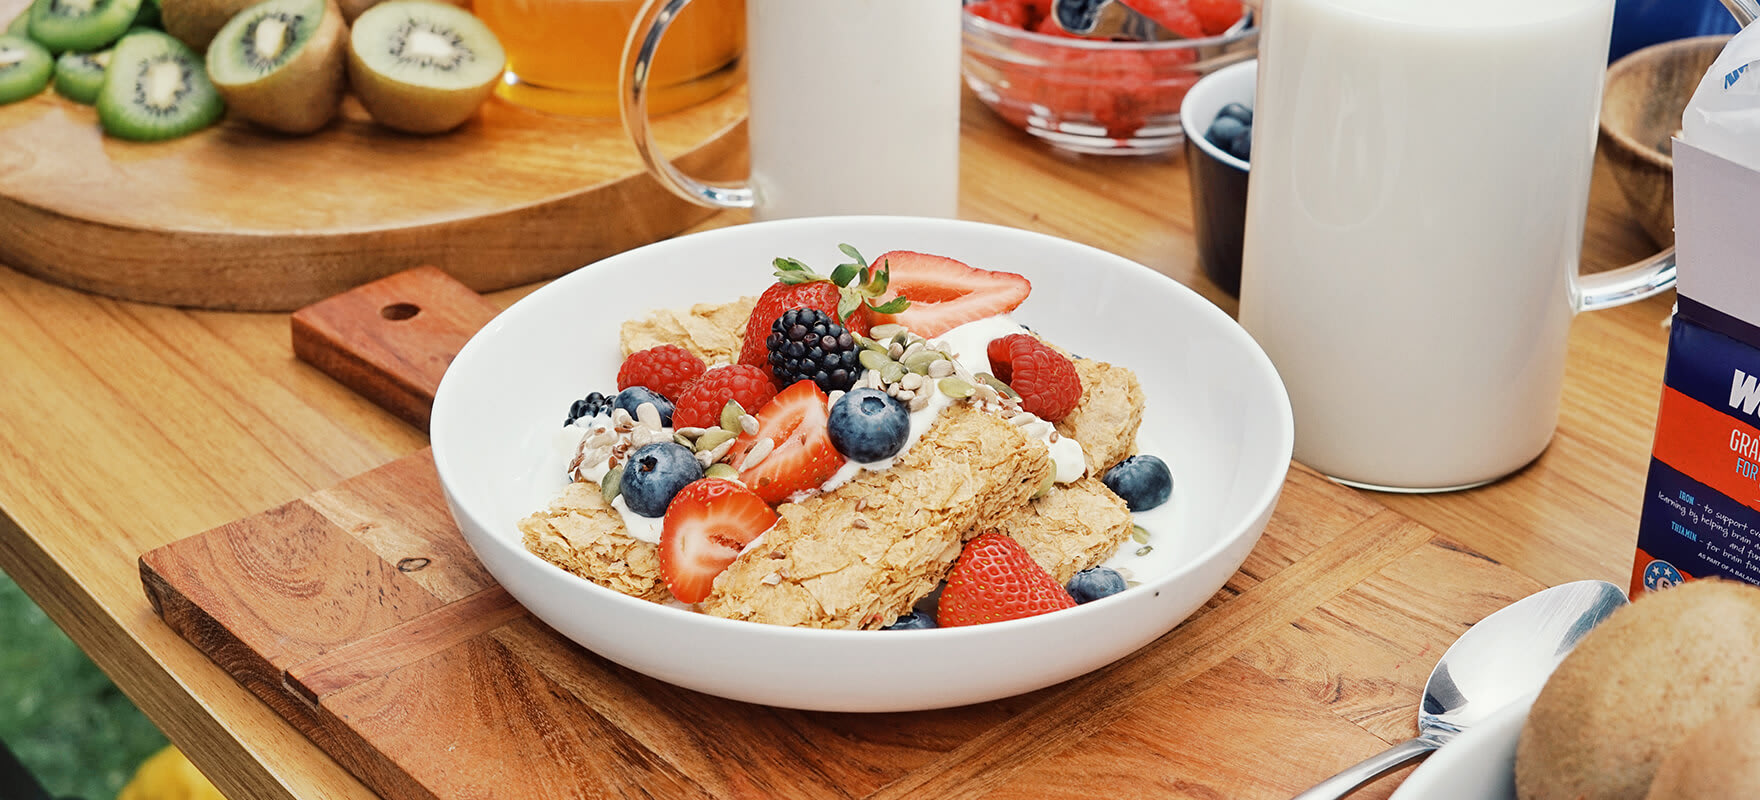 All Blacks Favourite - Weet-Bix™ Strawberries & Berries image 1